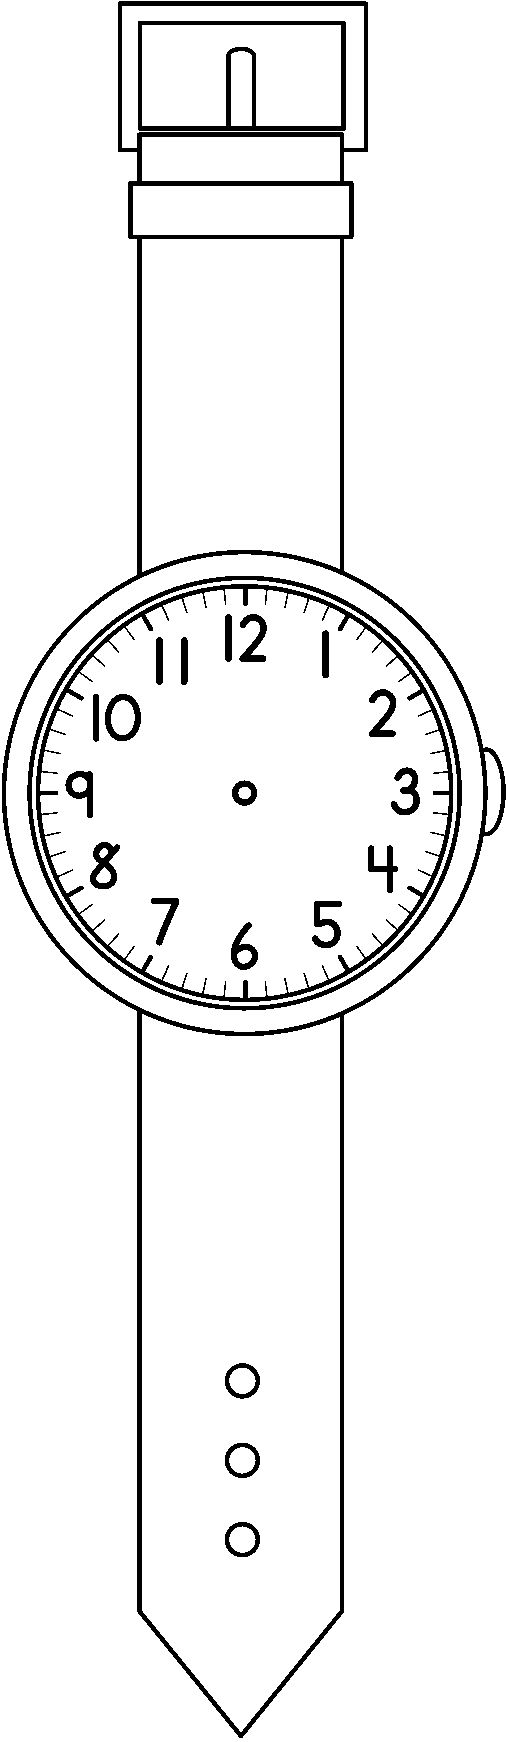 CLOCK_WATCH_BW.bmp (508×1742)